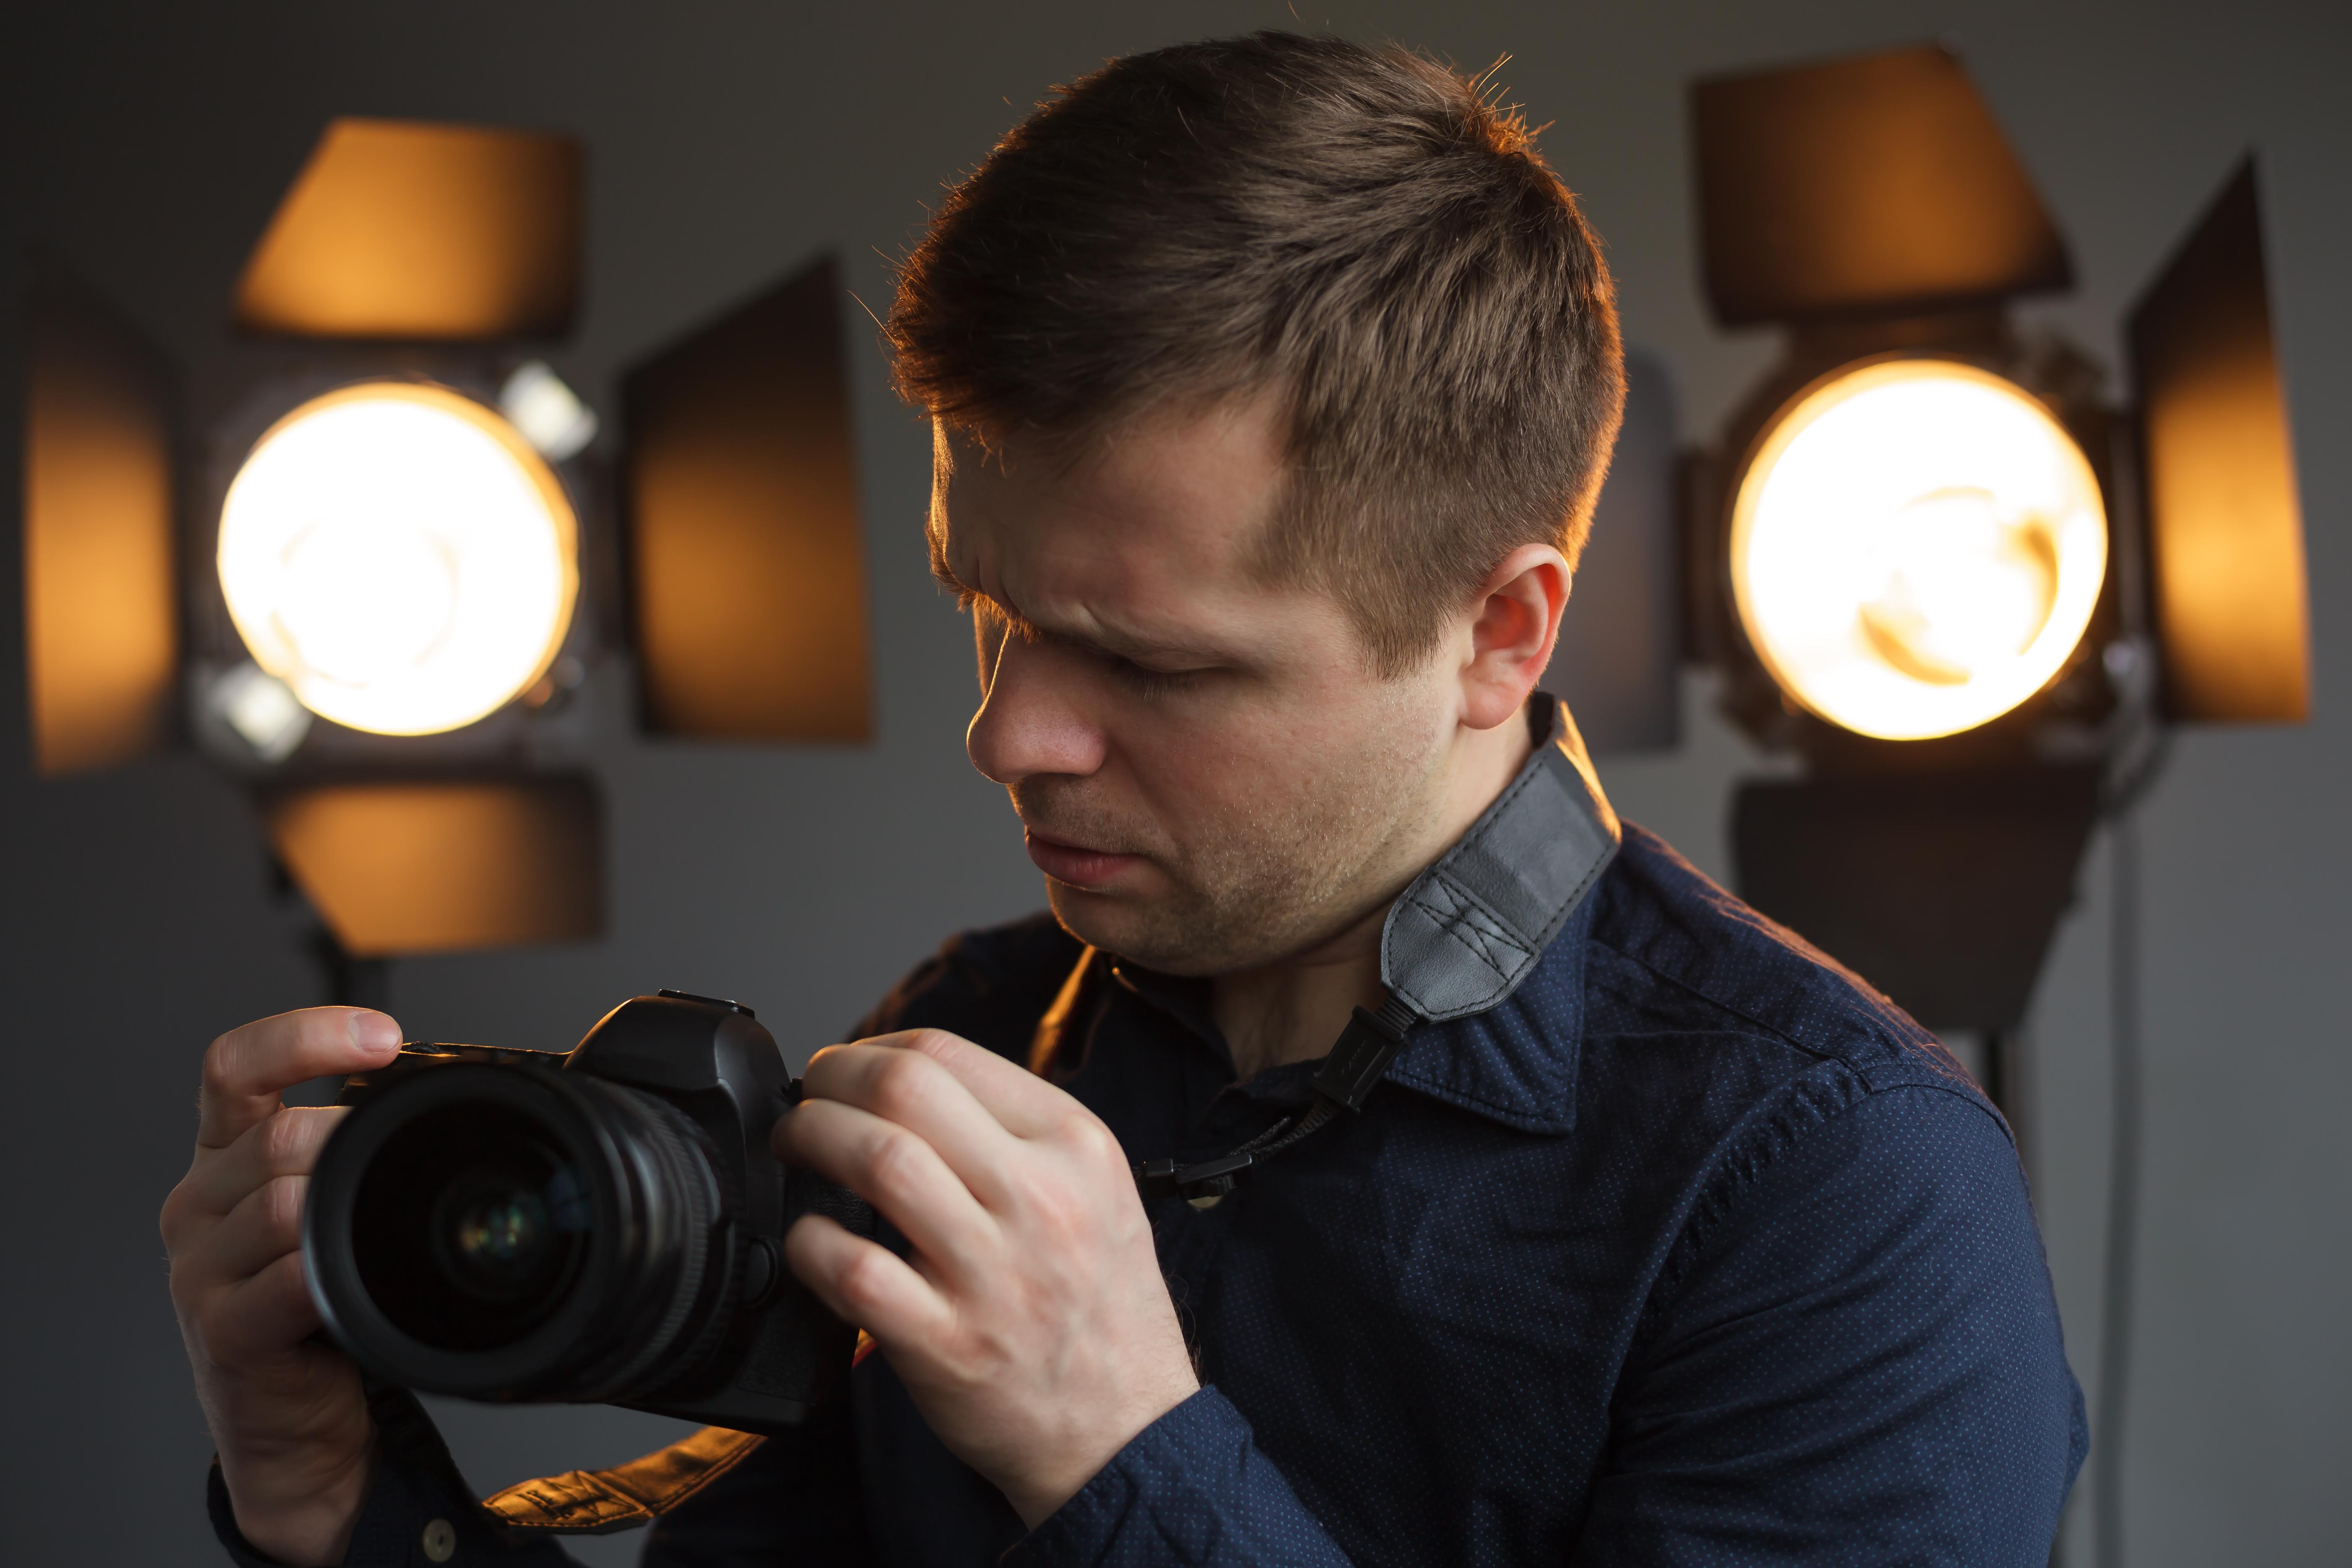 man camera photographer studio light barn doors